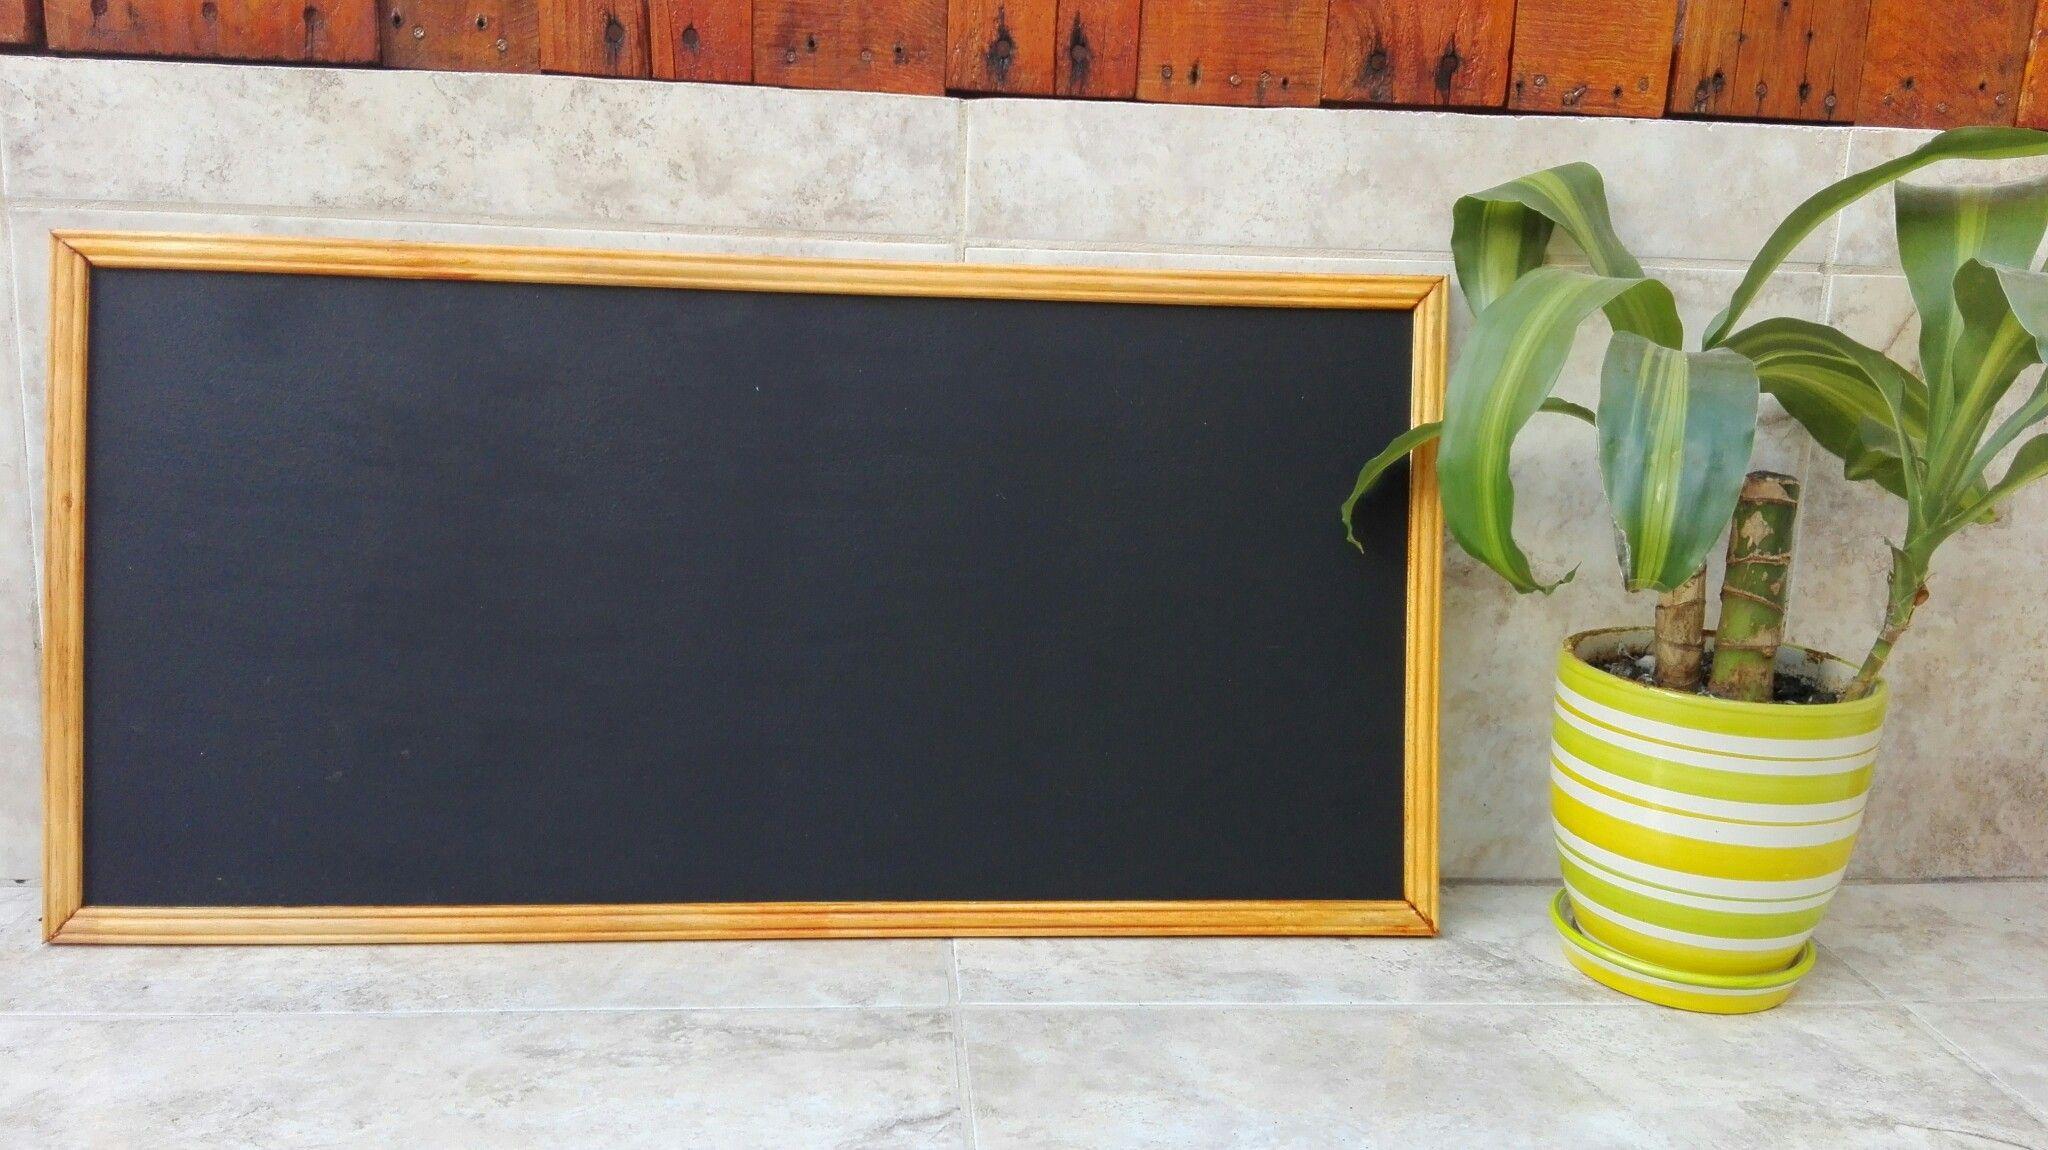 Pizarra Materiales Placa de madera Marcos para madera Pintura para ...